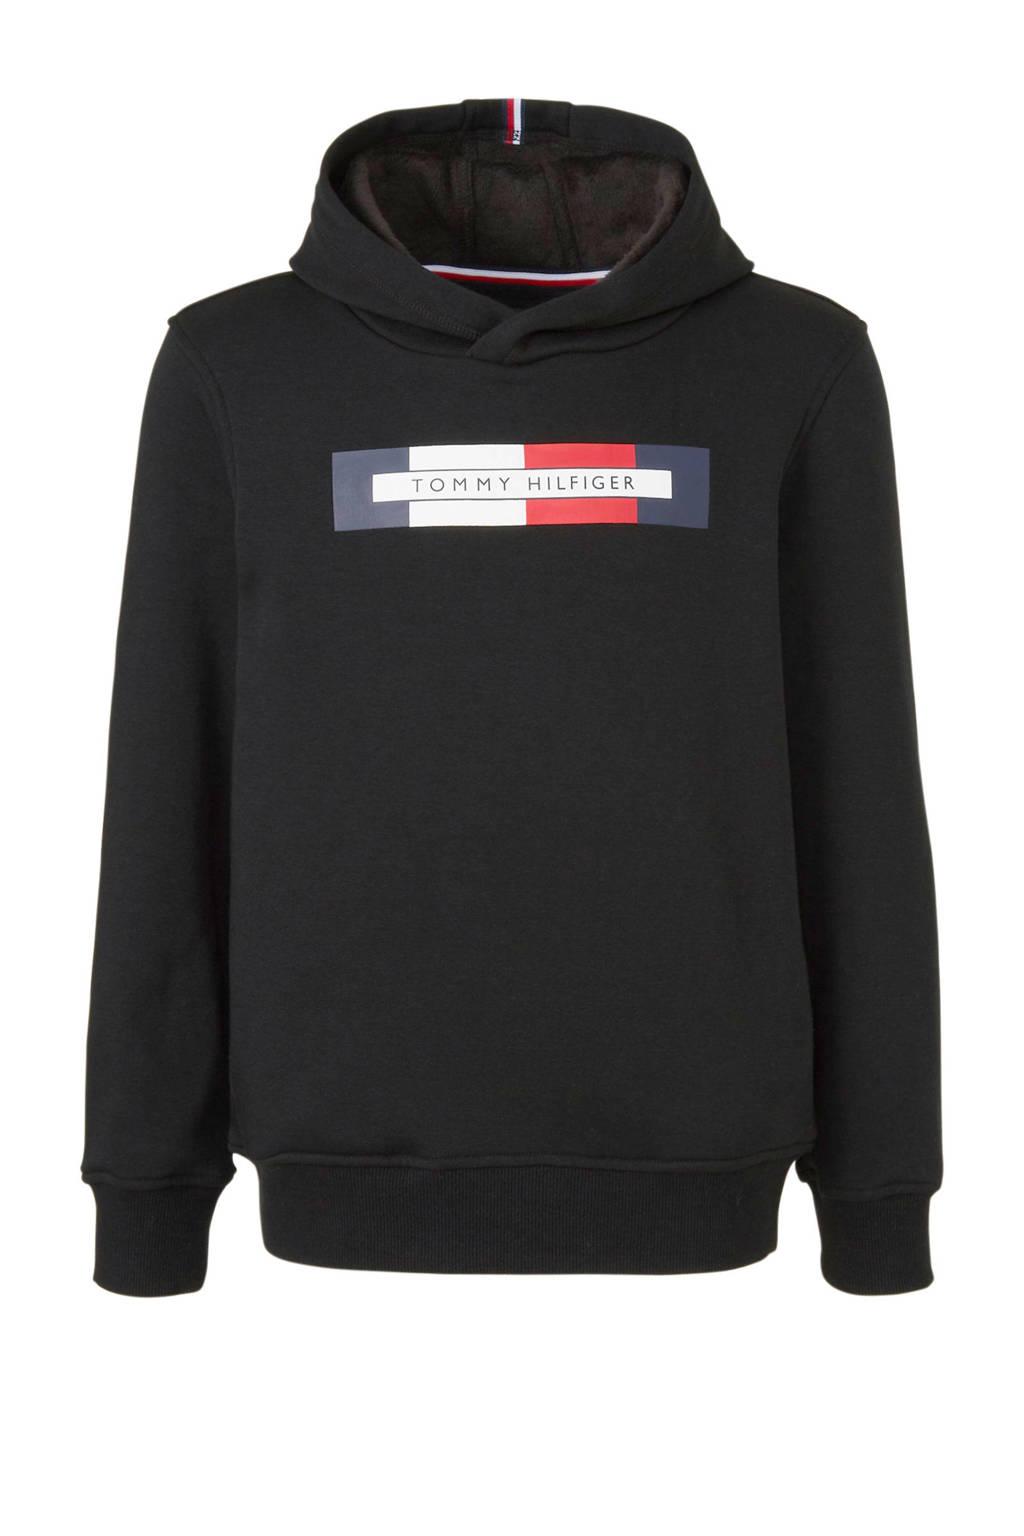 Tommy Hilfiger hoodie met logo zwart/rood/wit/donkerbauw, Zwart/rood/wit/donkerbauw